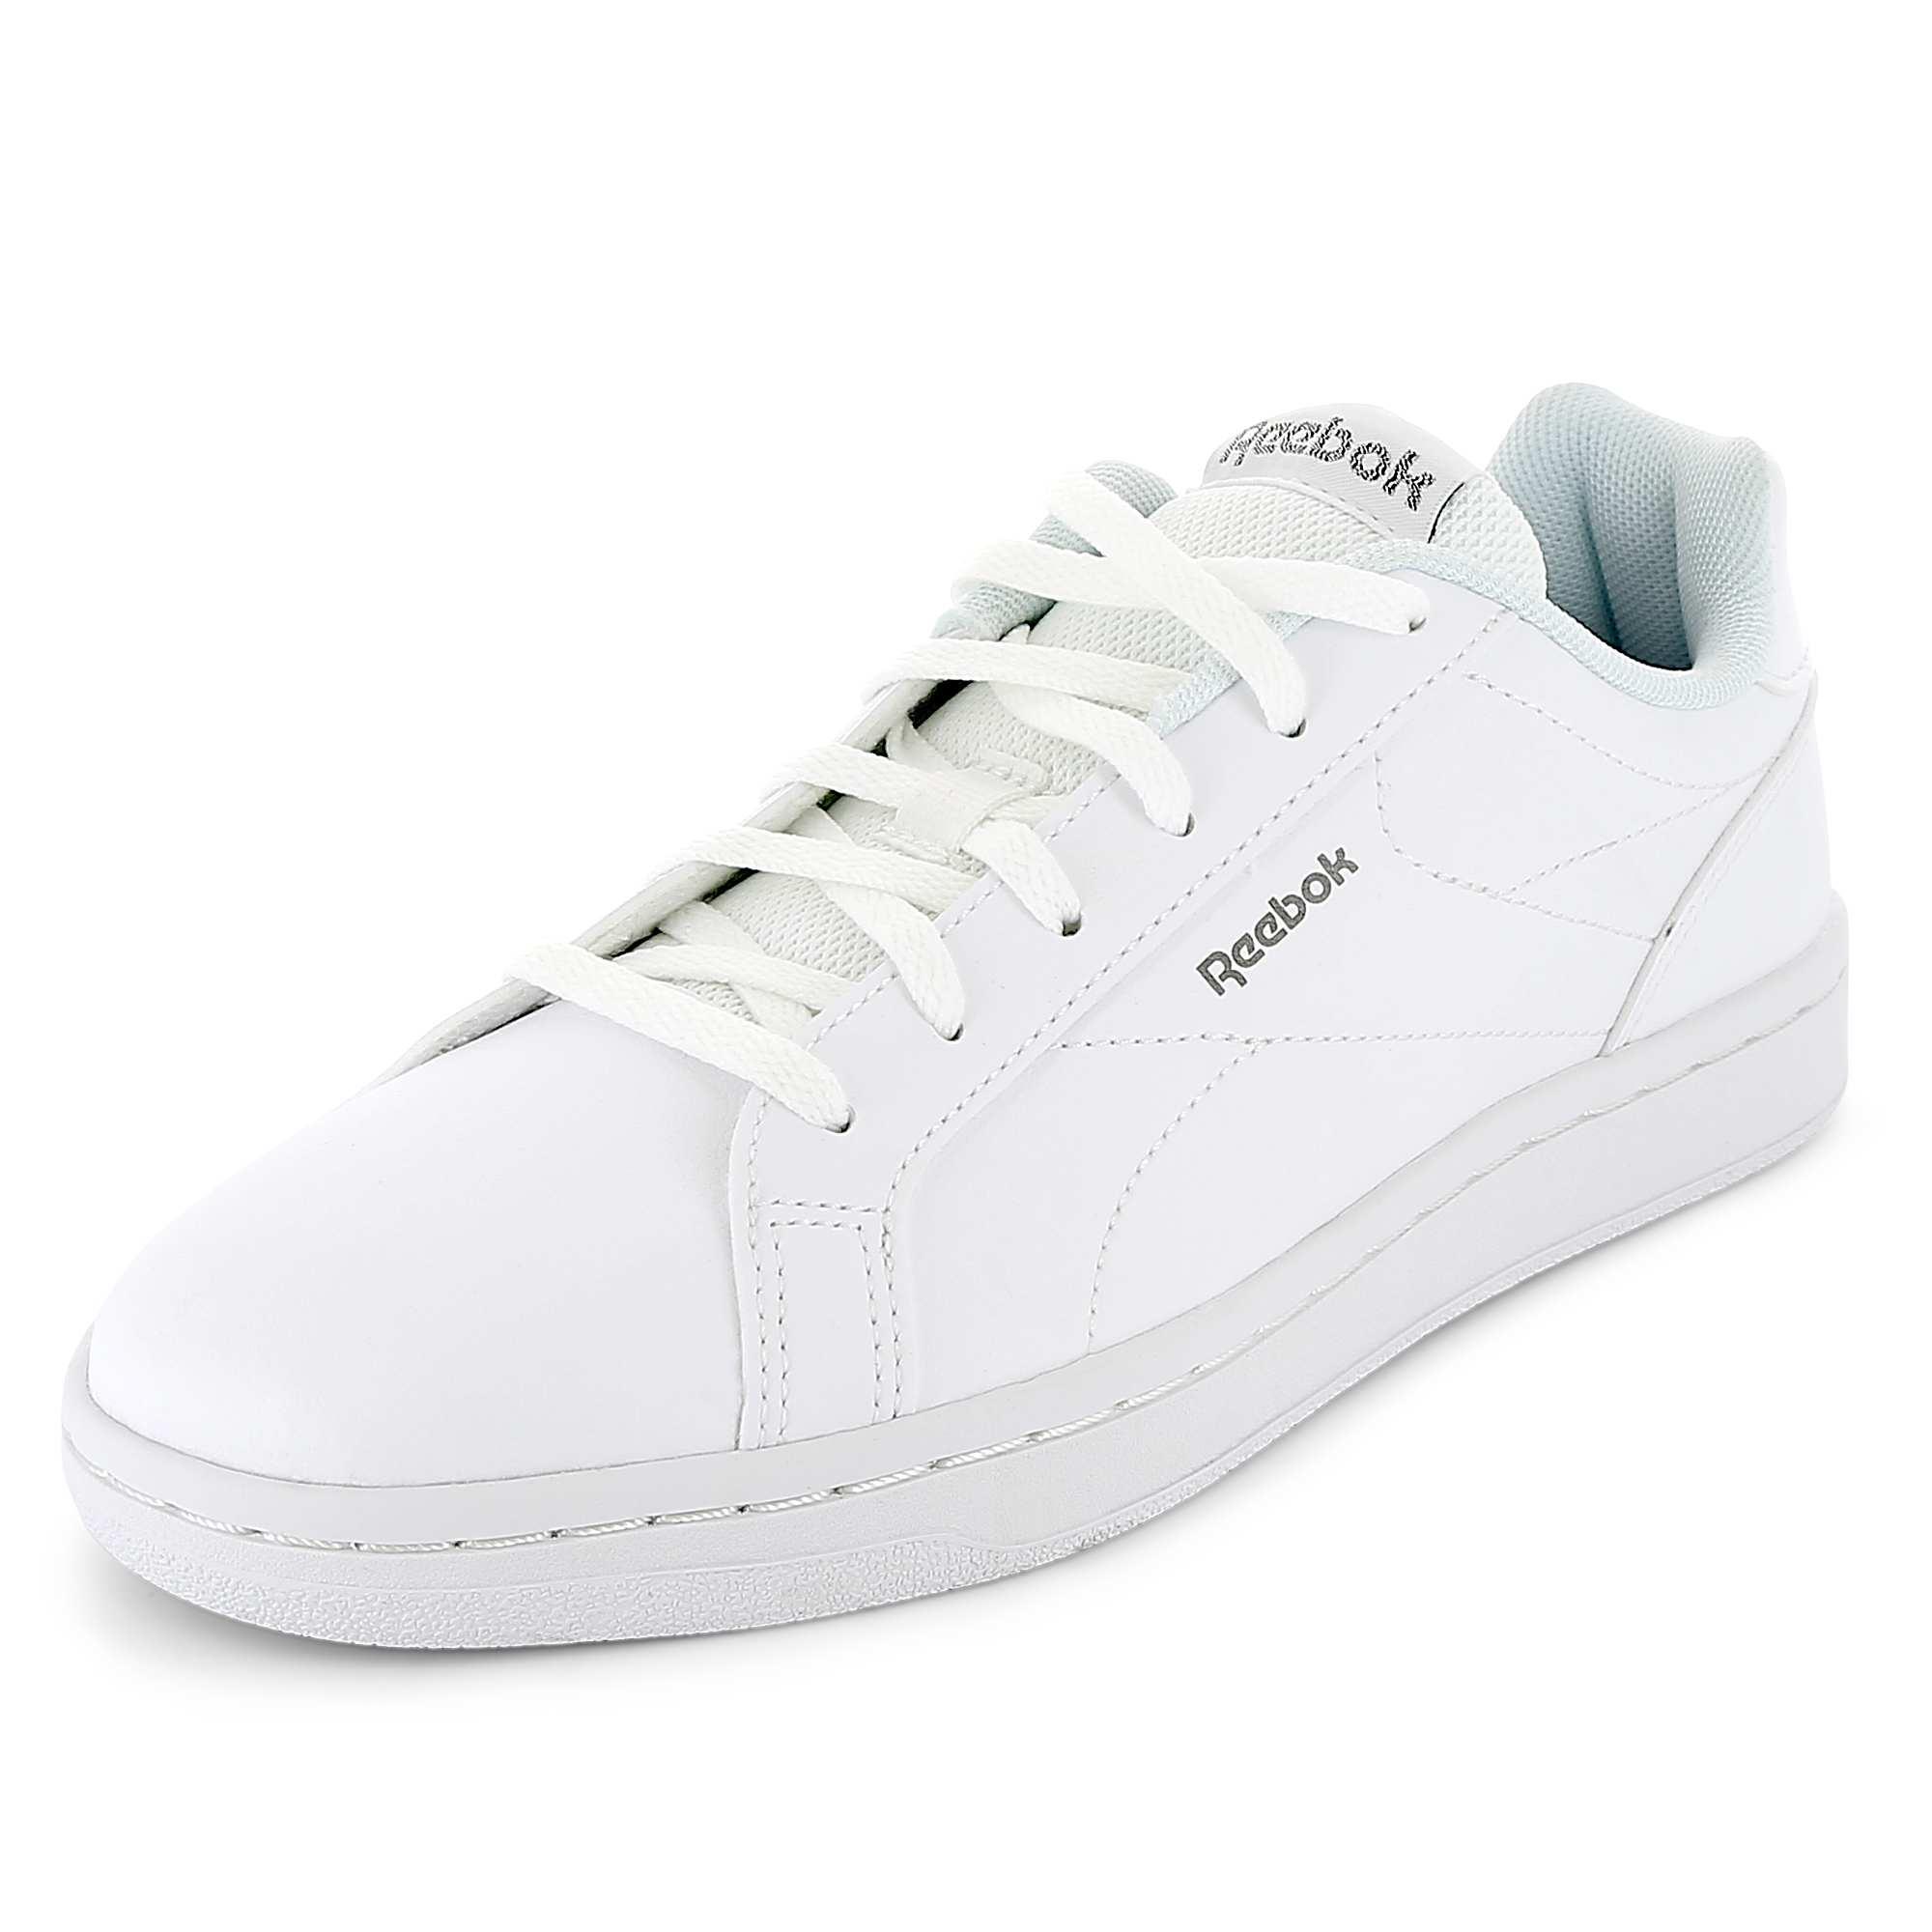 Lage sneakers 'Reebok' 'Royal Complete CLN' wit Dameskleding. Loading zoom